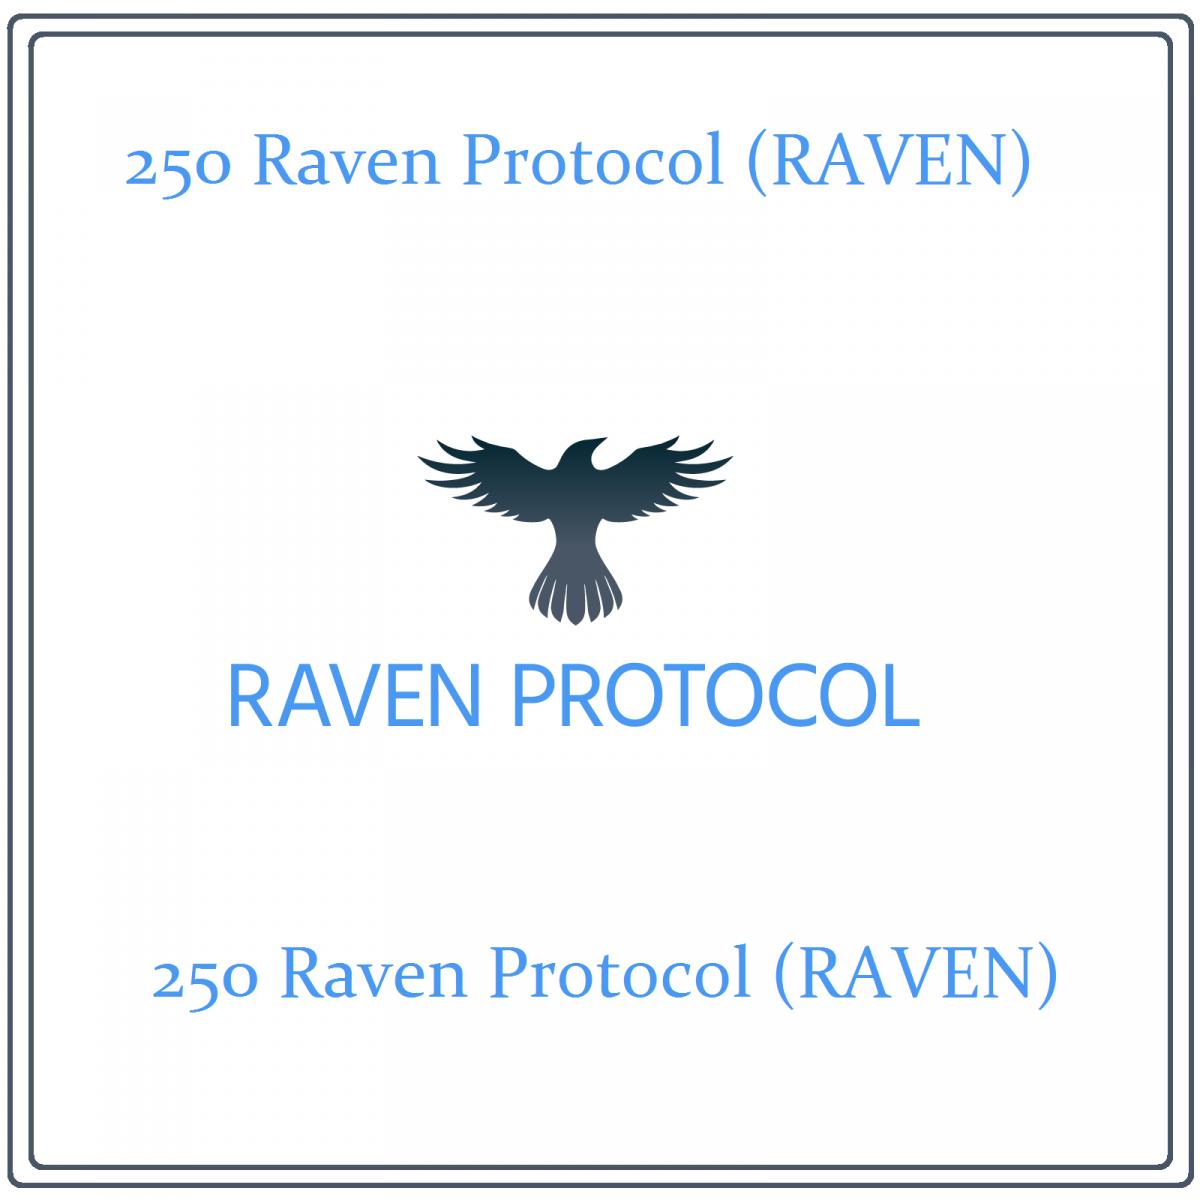 250 Raven Protocol (RAVEN) Mining Contract